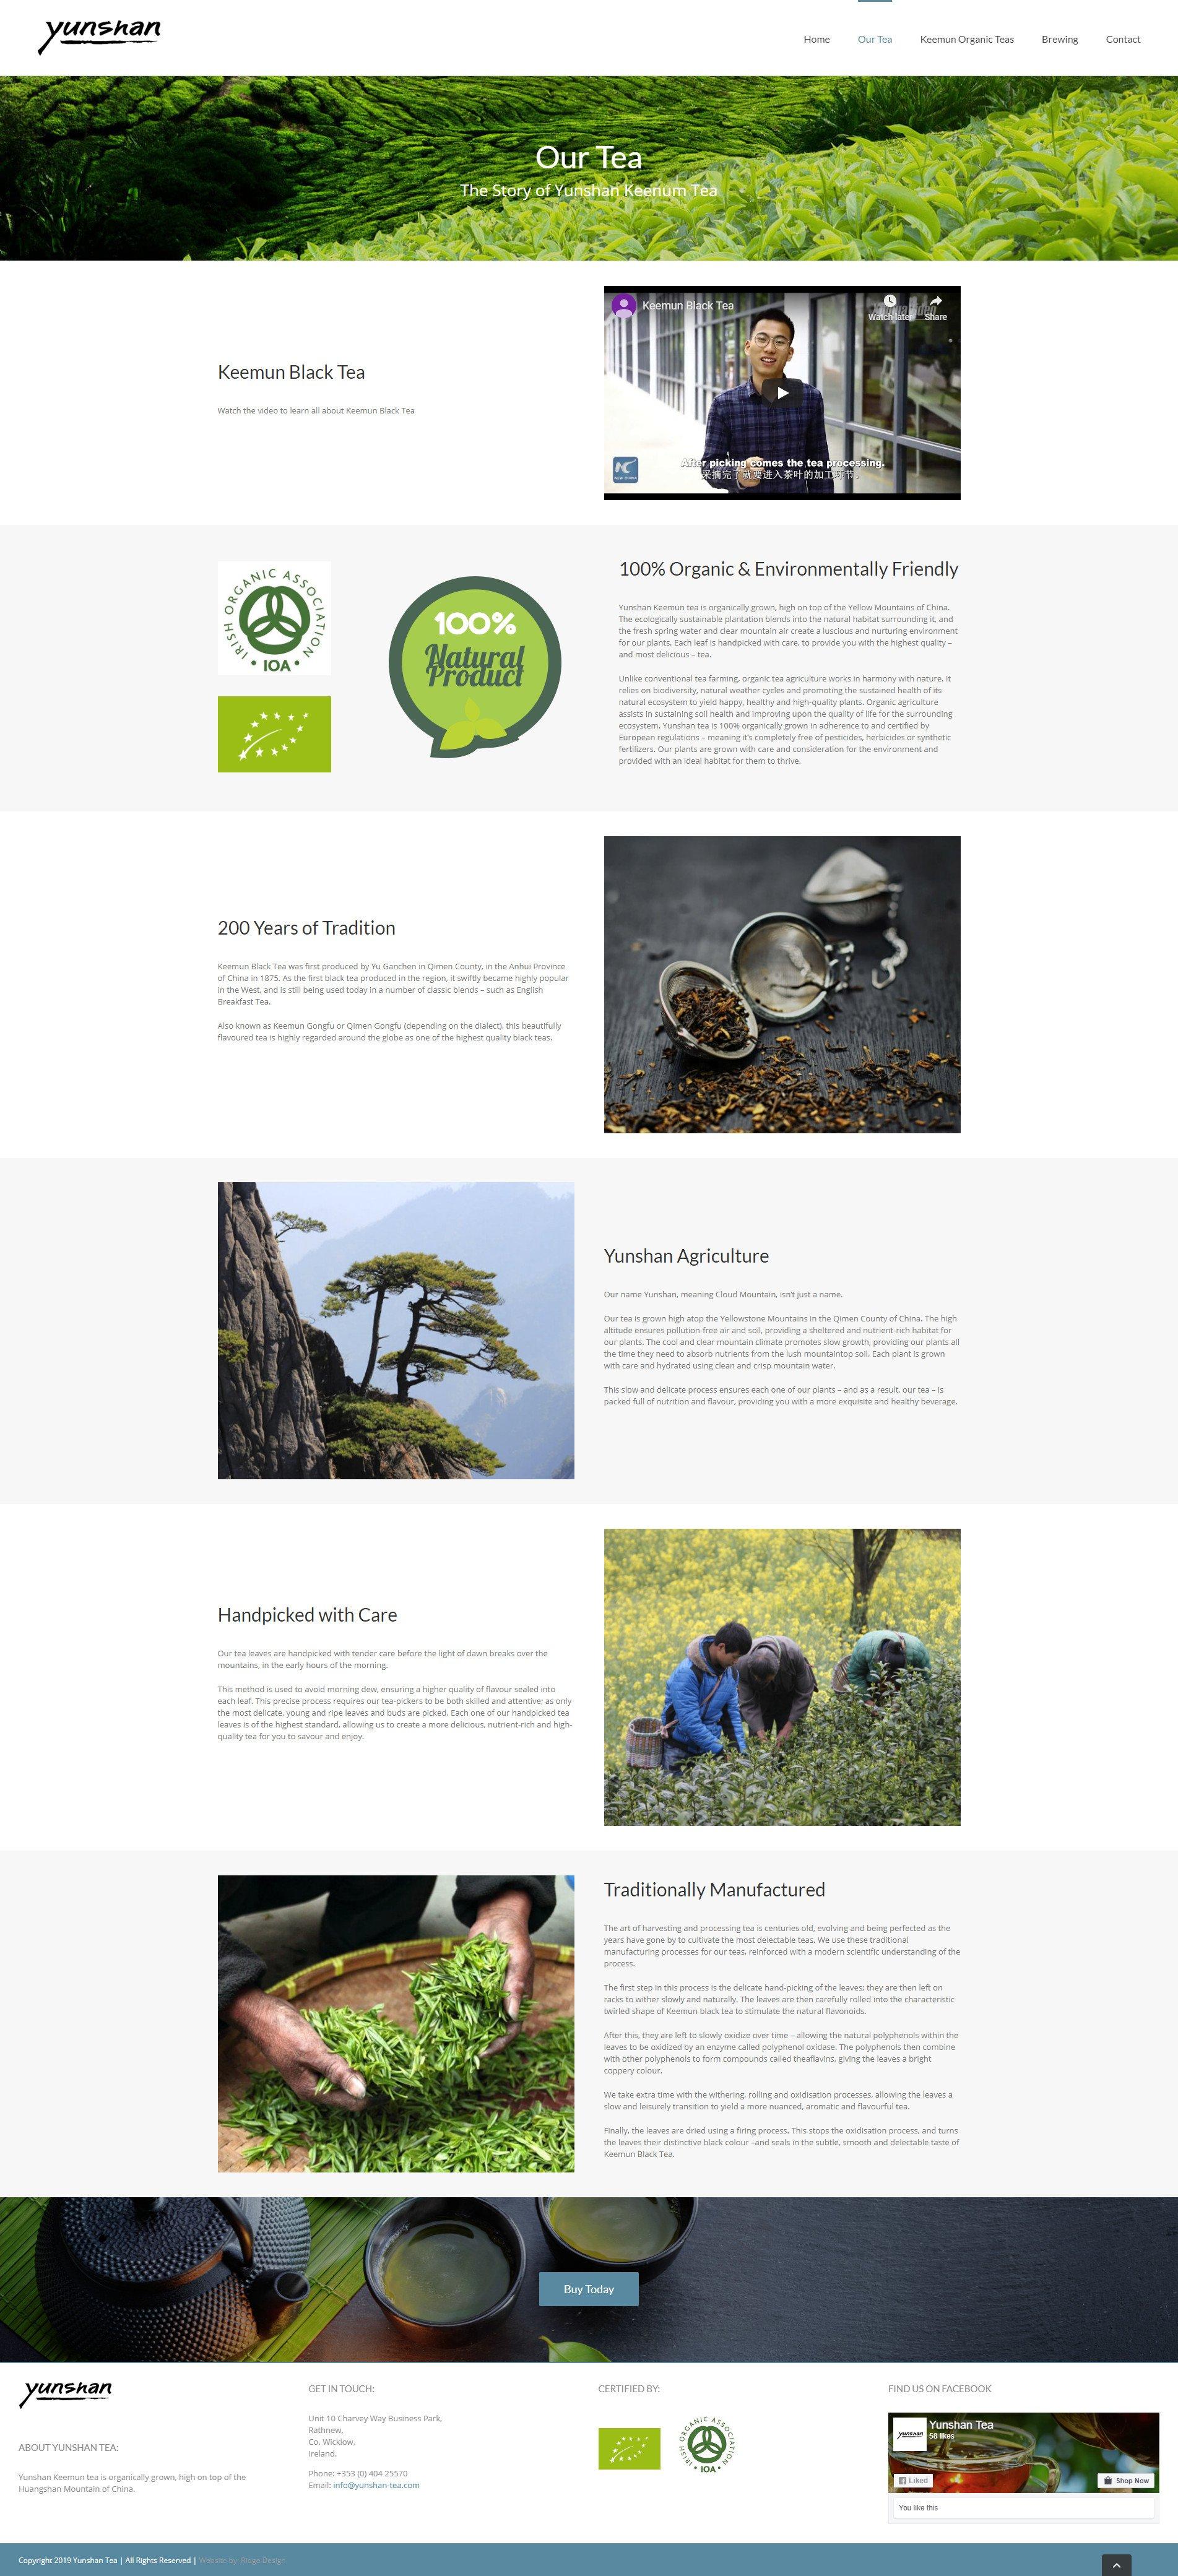 Yunshan-Tea-Website-Design-Our-Tea-Page